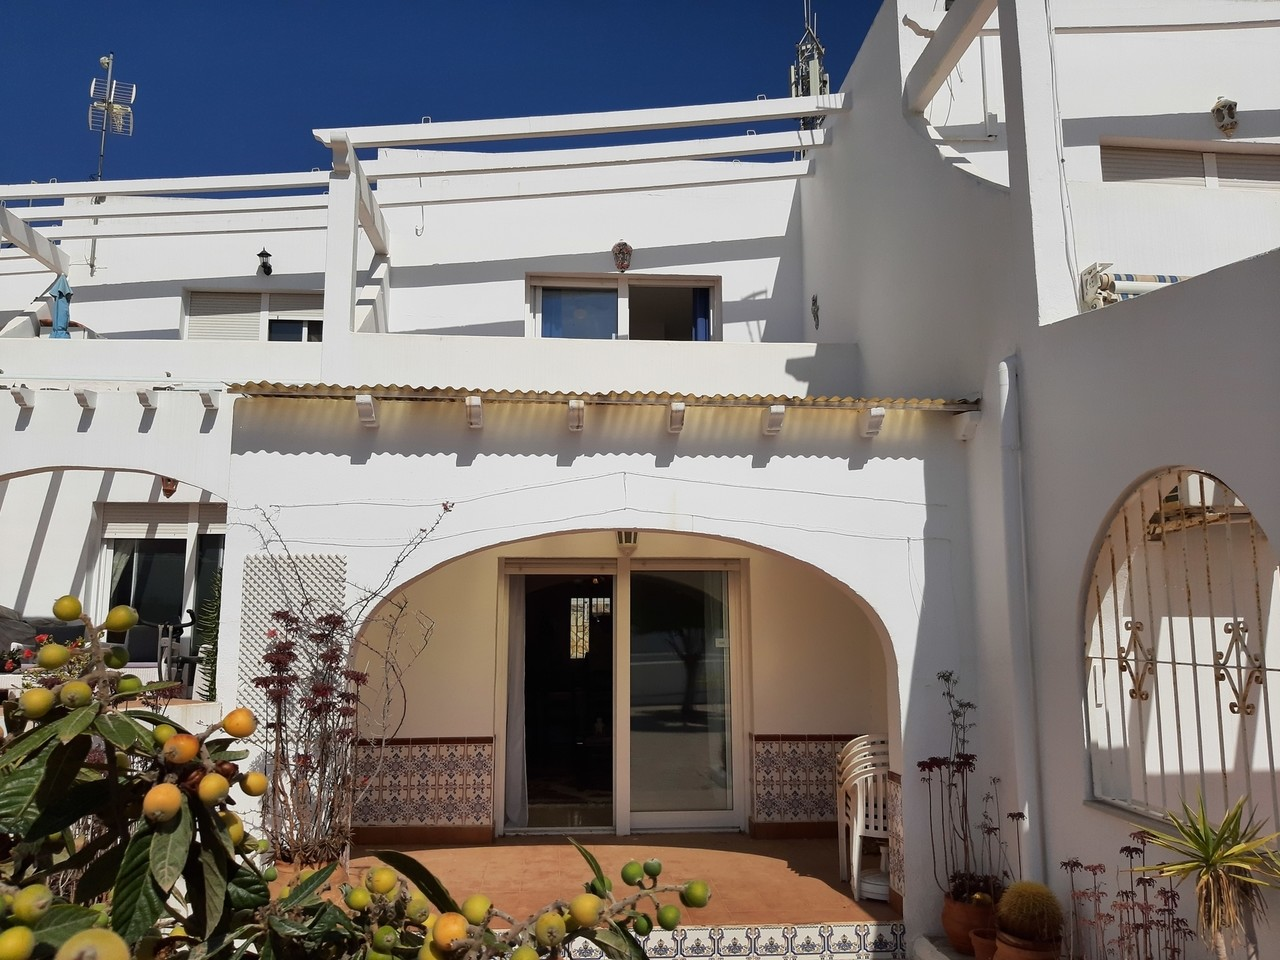 Duplex/townhouse located in Mojacar